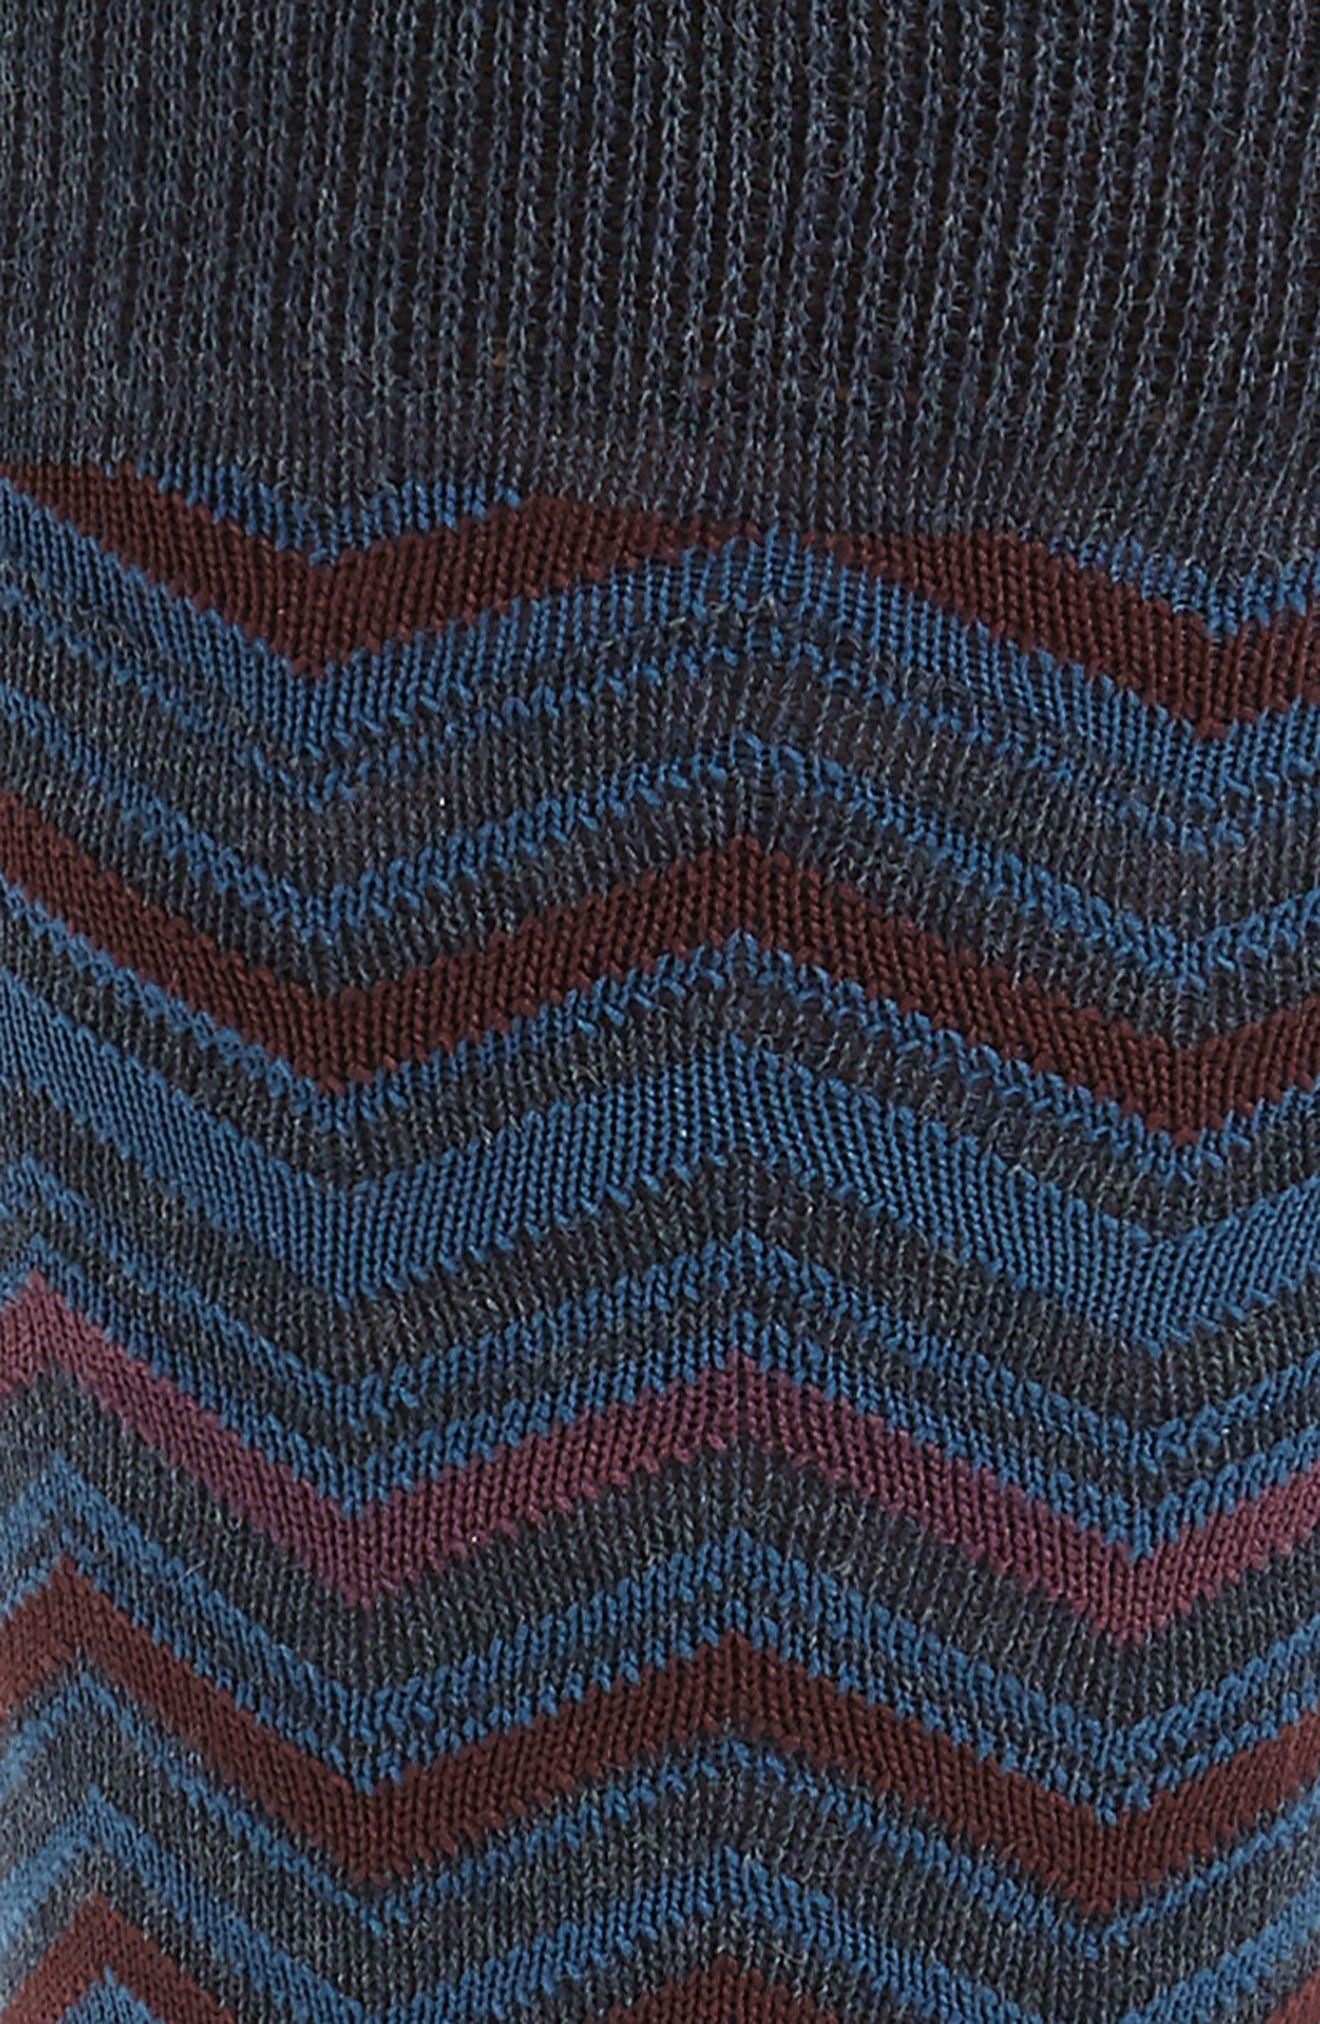 Chevron Socks,                             Alternate thumbnail 2, color,